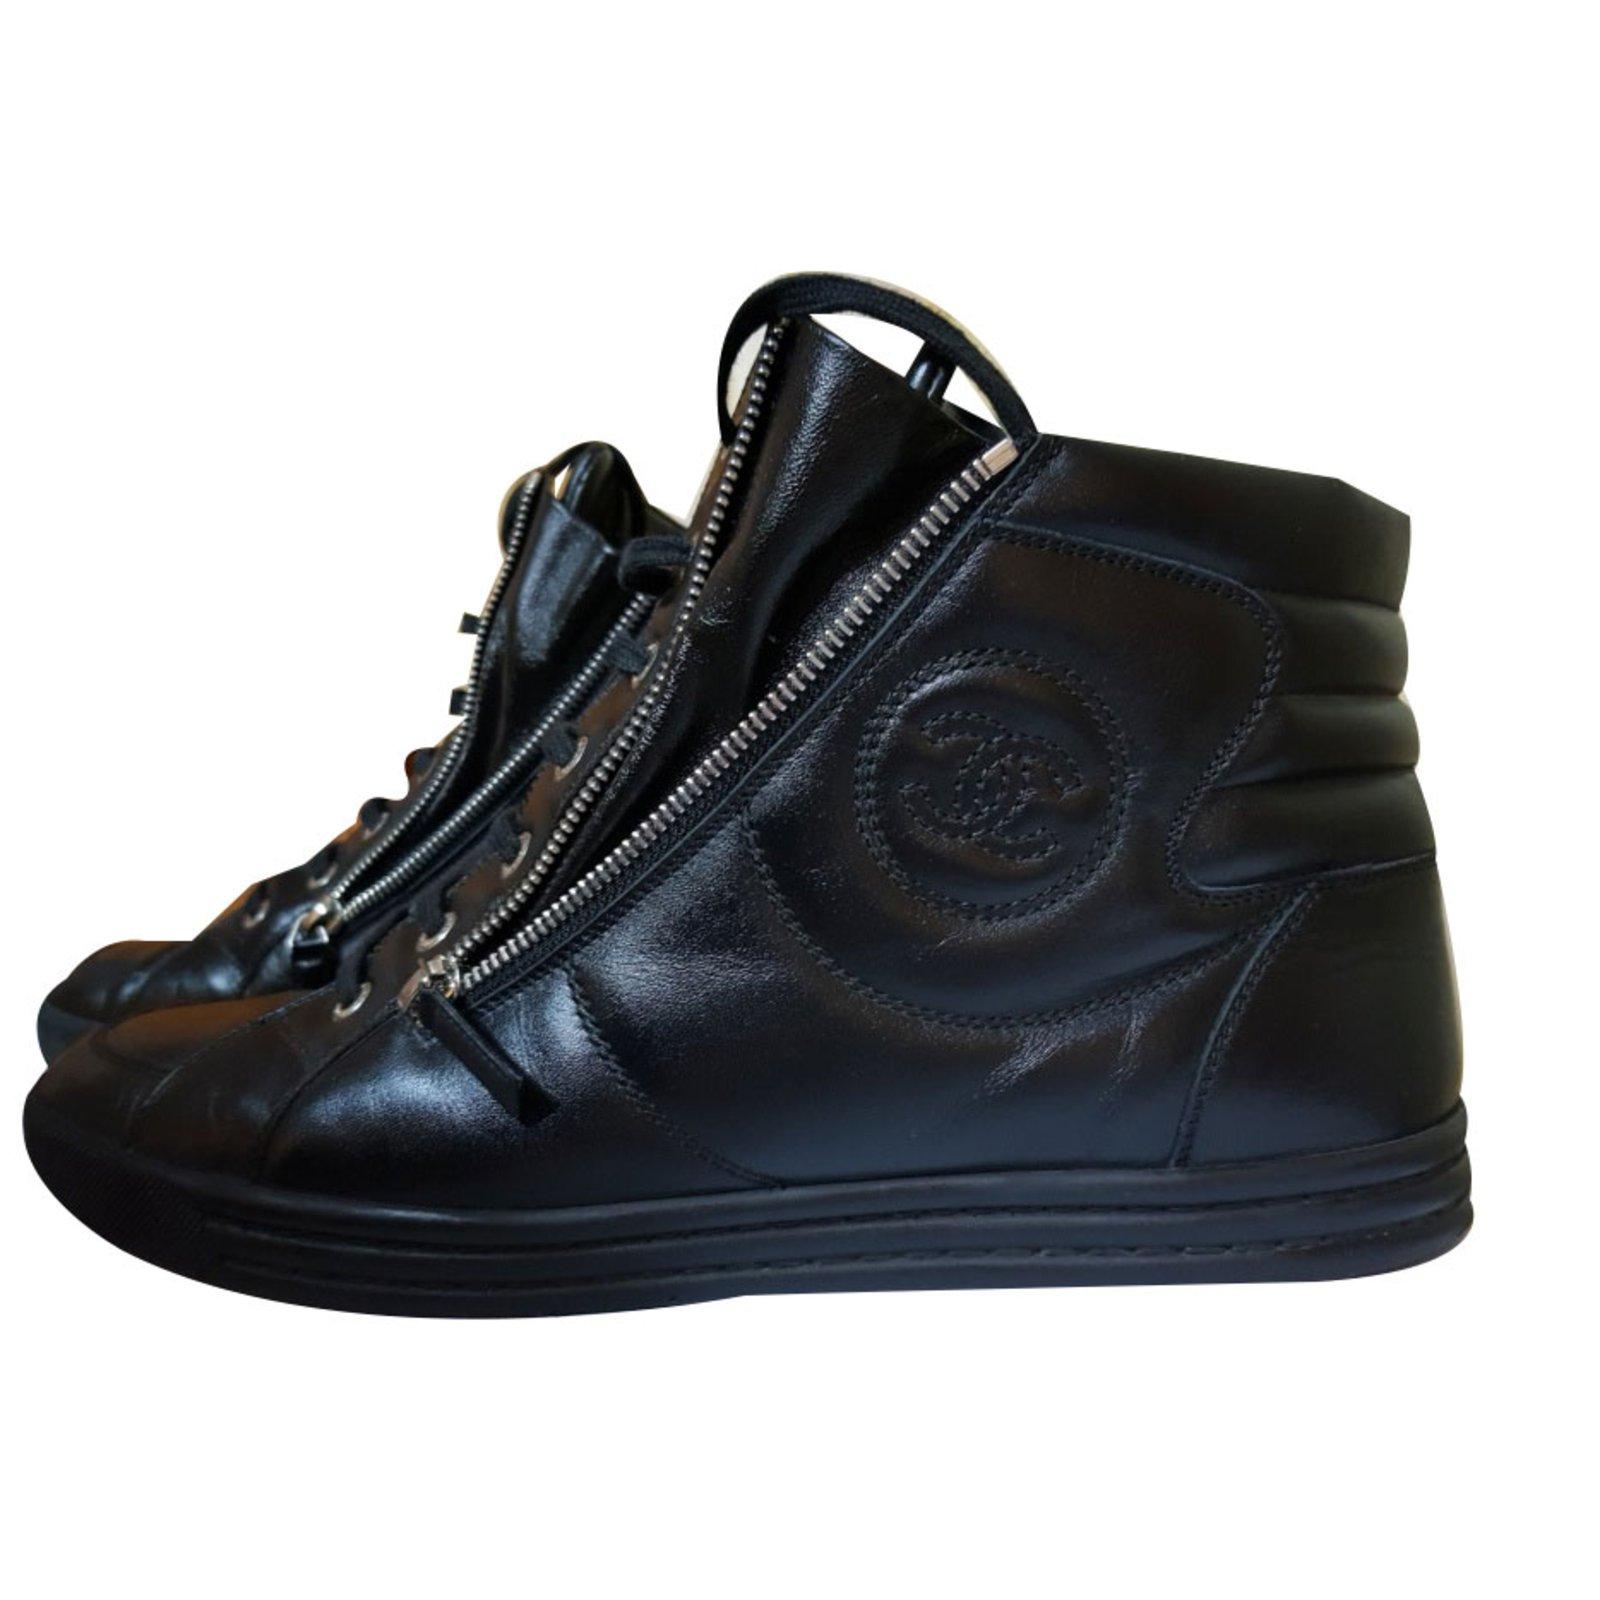 Baskets homme Chanel Baskets homme Cuir Noir ref.69996 - Joli Closet 7b6916812ac